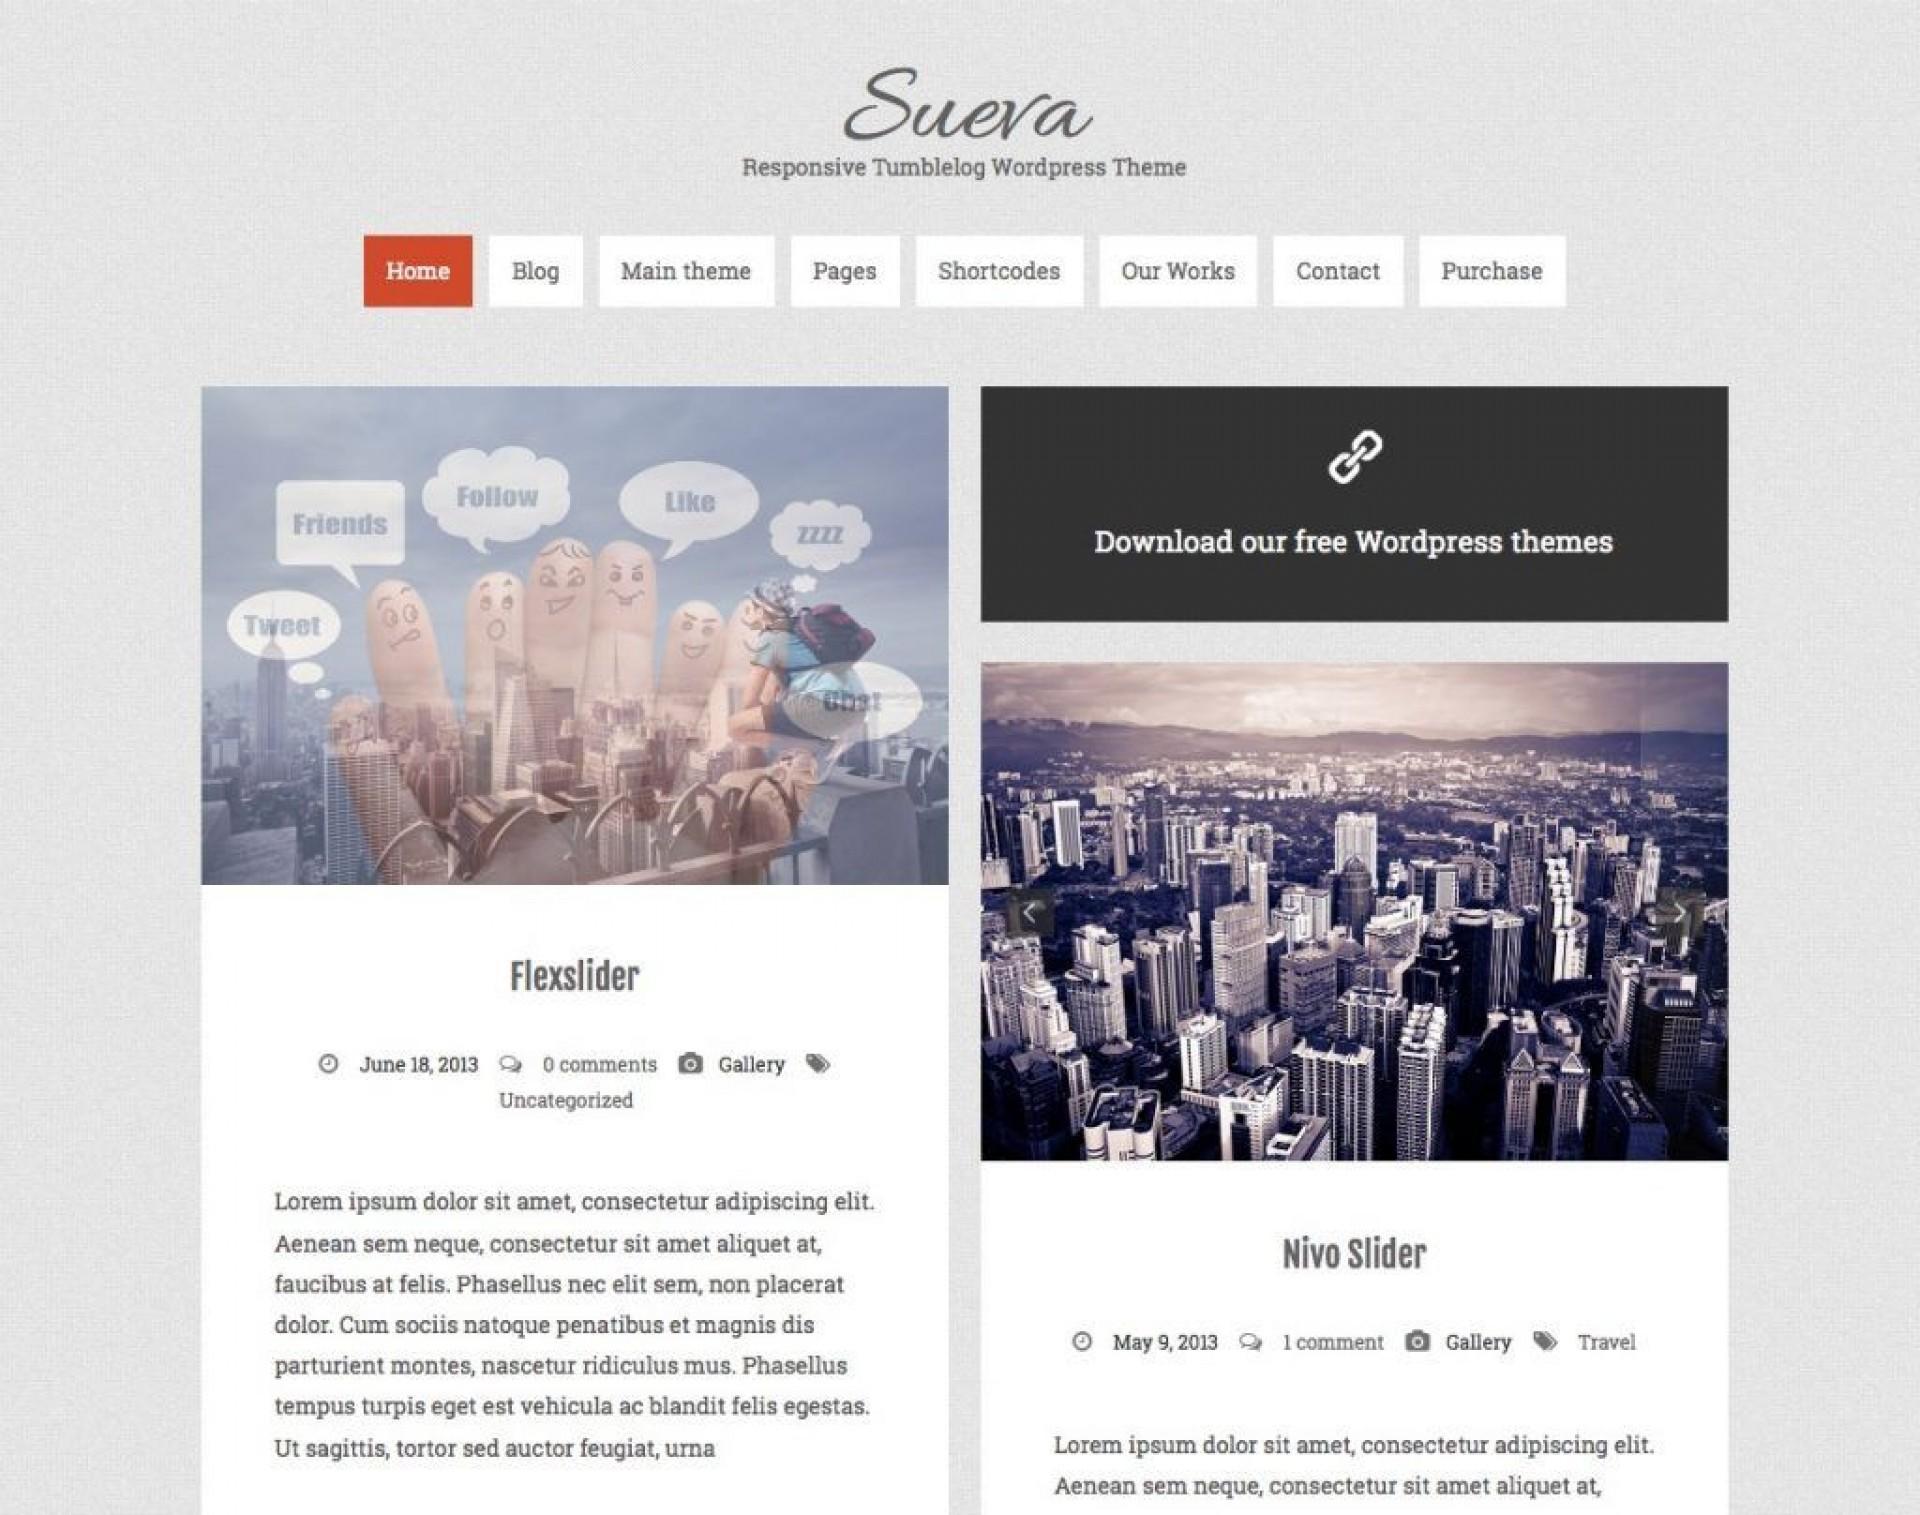 004 Stupendou Free Blog Template Wordpres Highest Clarity  Wordpress Best Travel Theme Food 20201920